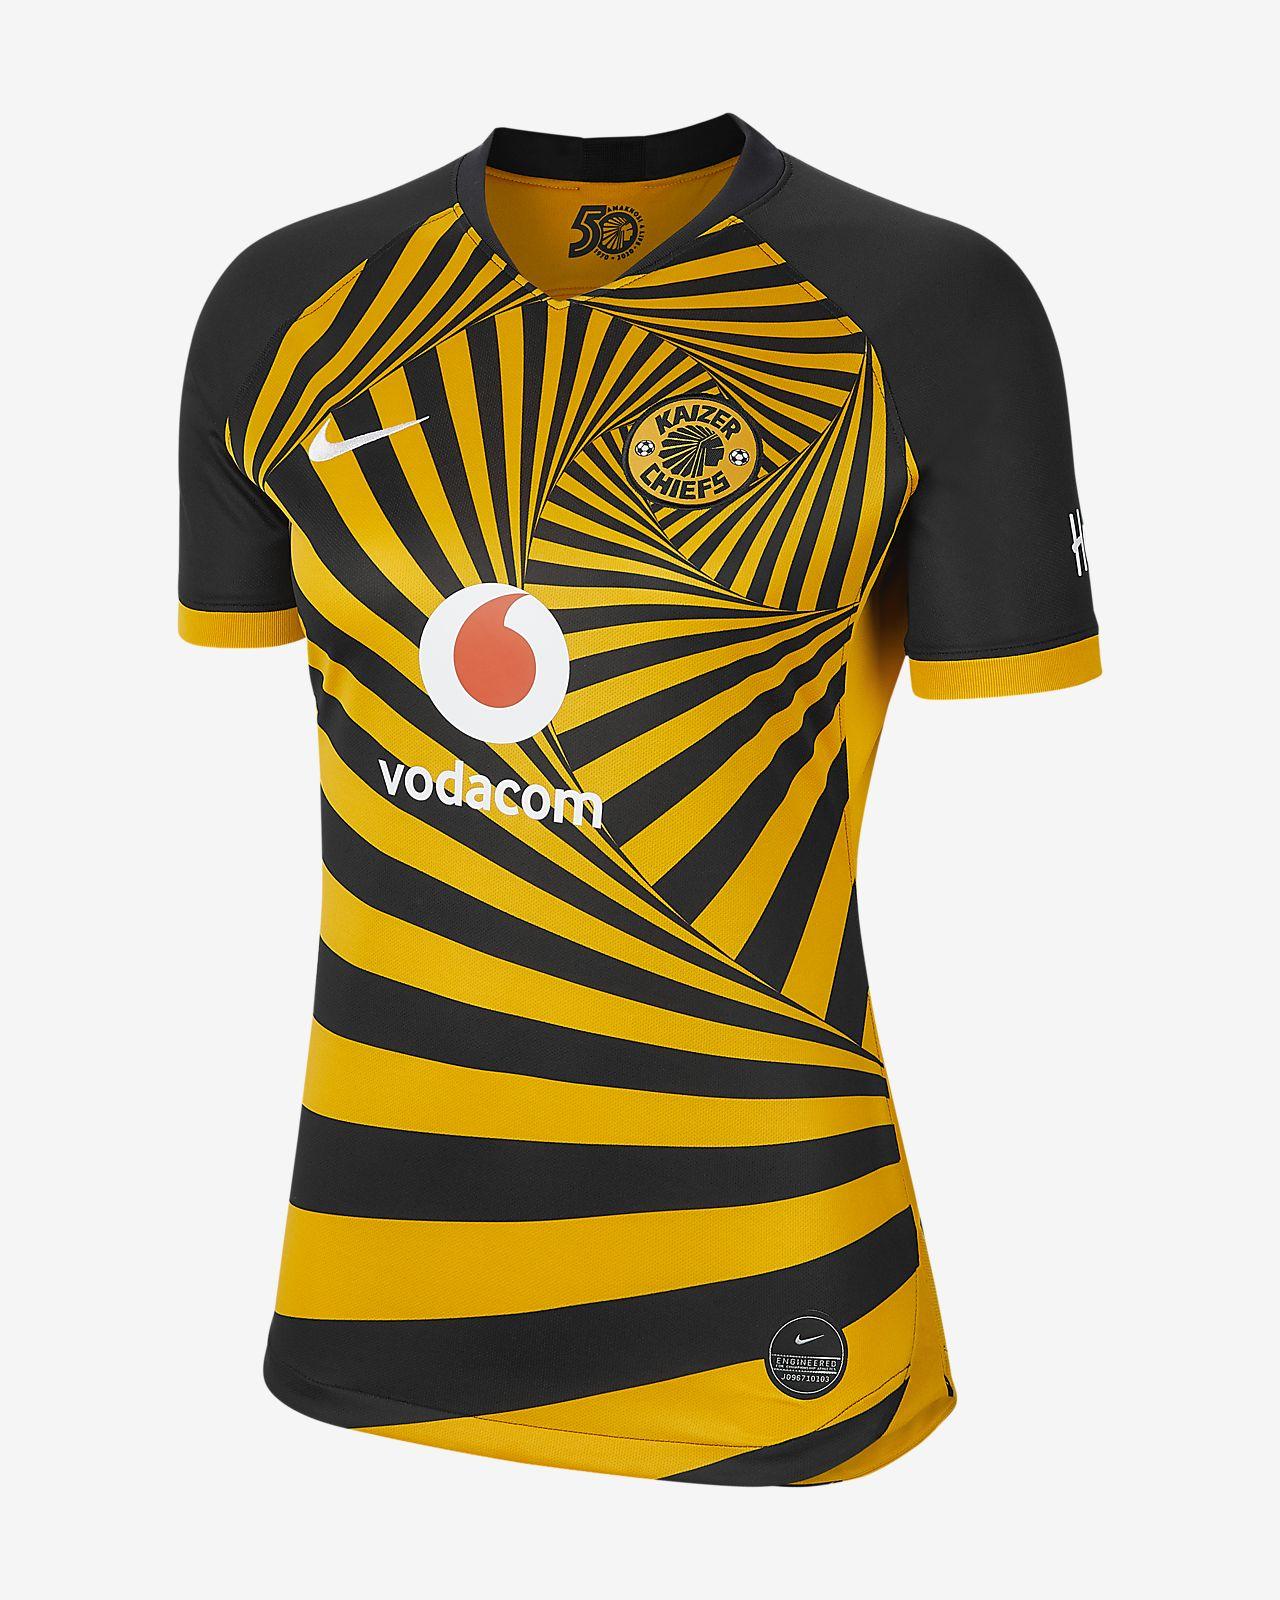 Kaizer Chiefs F.C. 2019/20 Stadium Home Women's Football Shirt